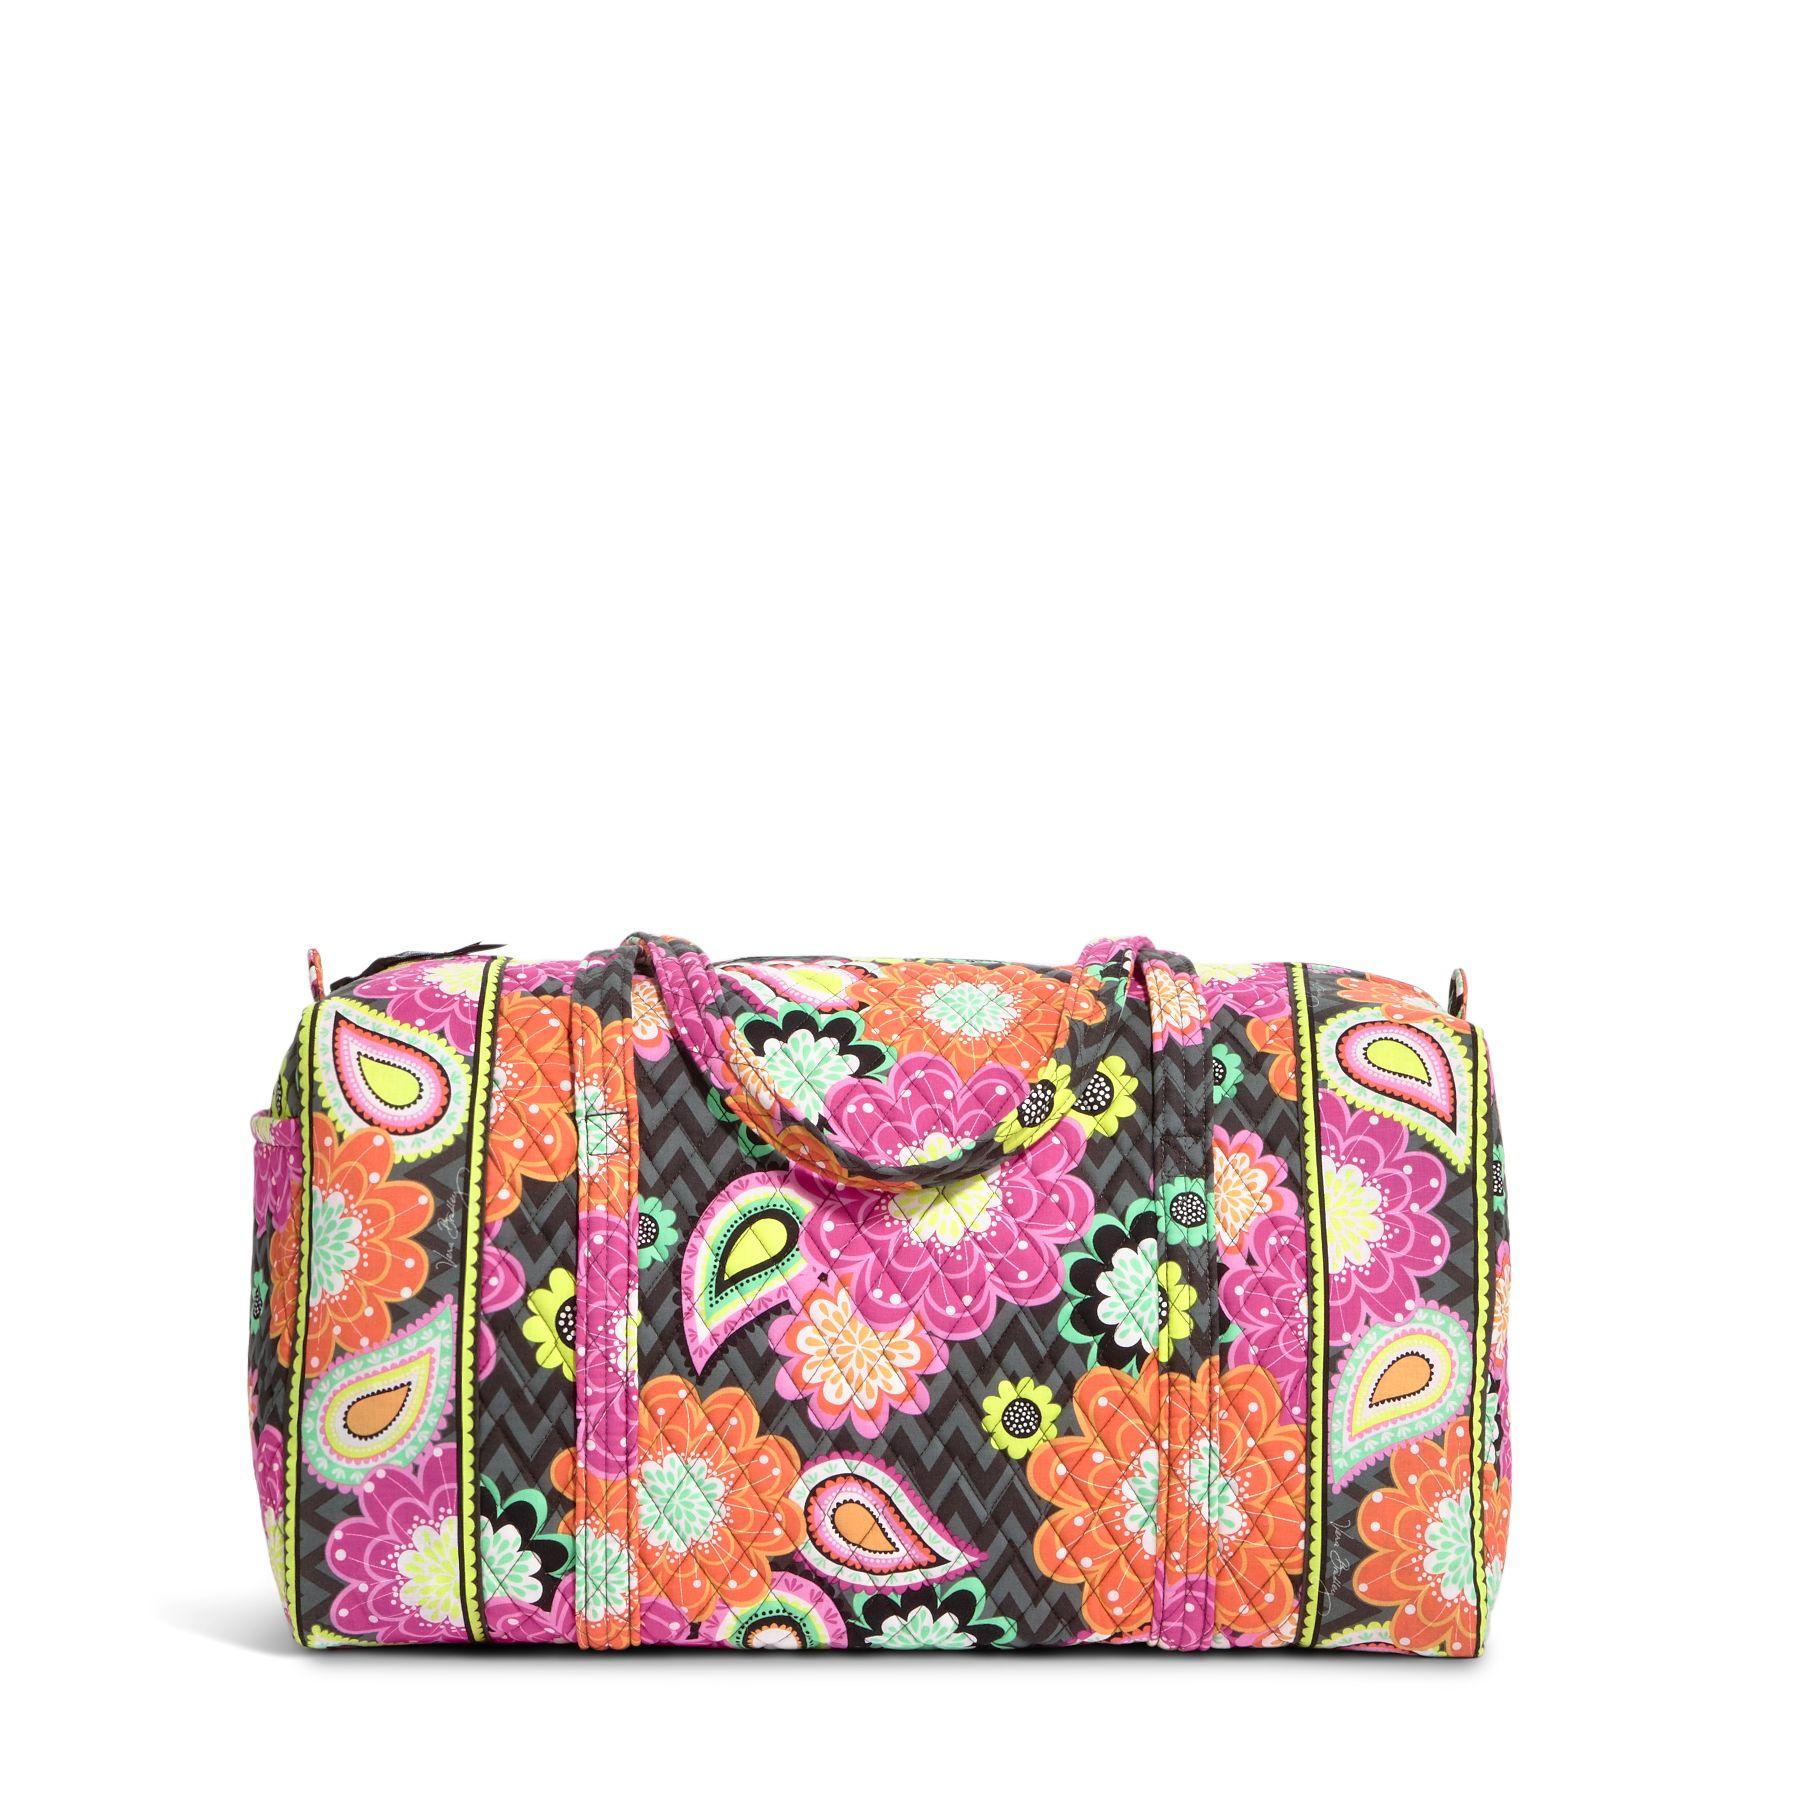 Vera Bradley Large Duffel Travel Bag in Ziggy Zinnia